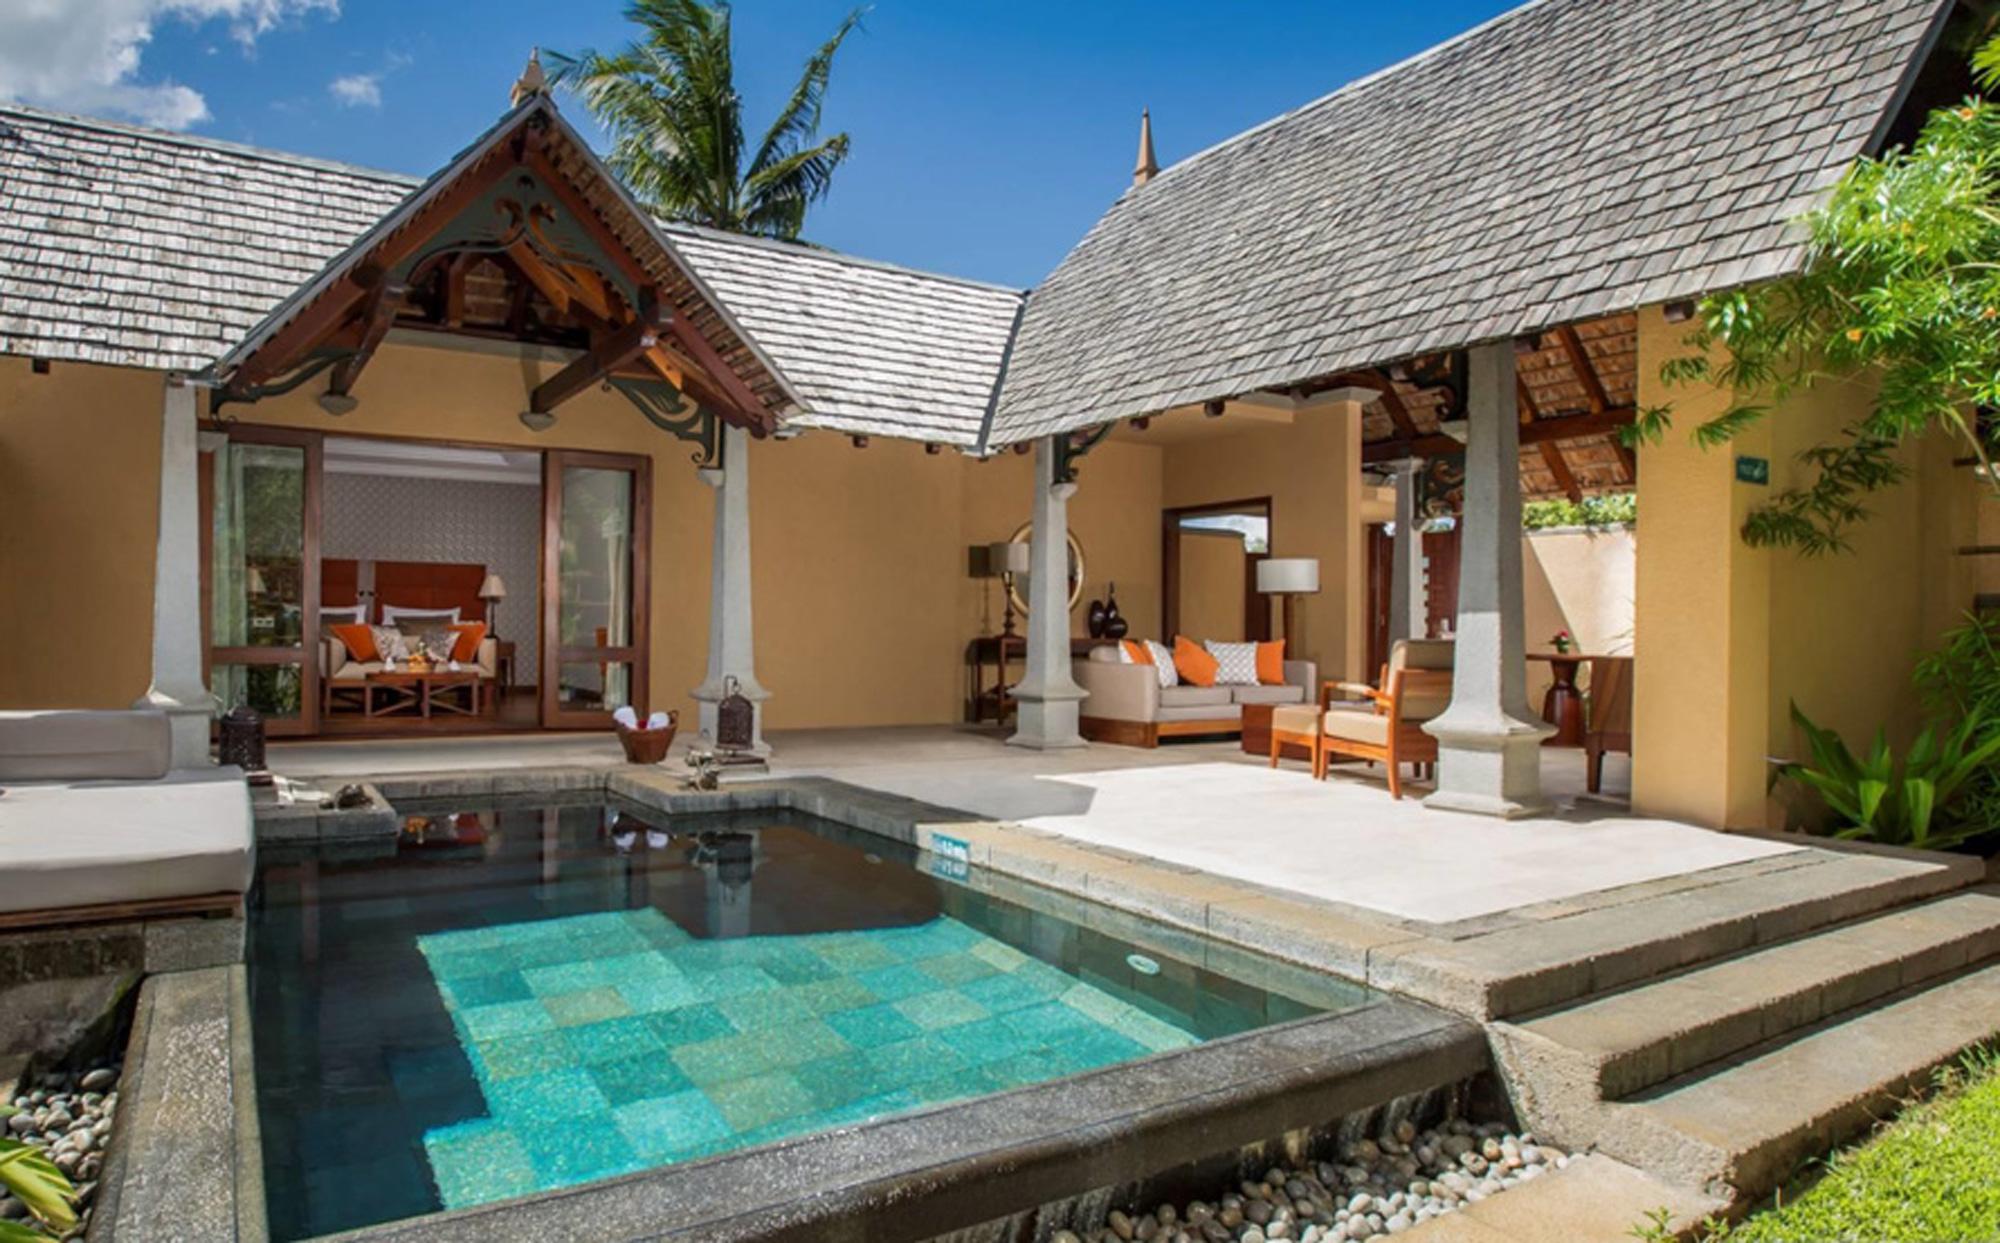 毛里求斯马拉迪瓦别墅<br/>Maradiva Villas Resort and Spa